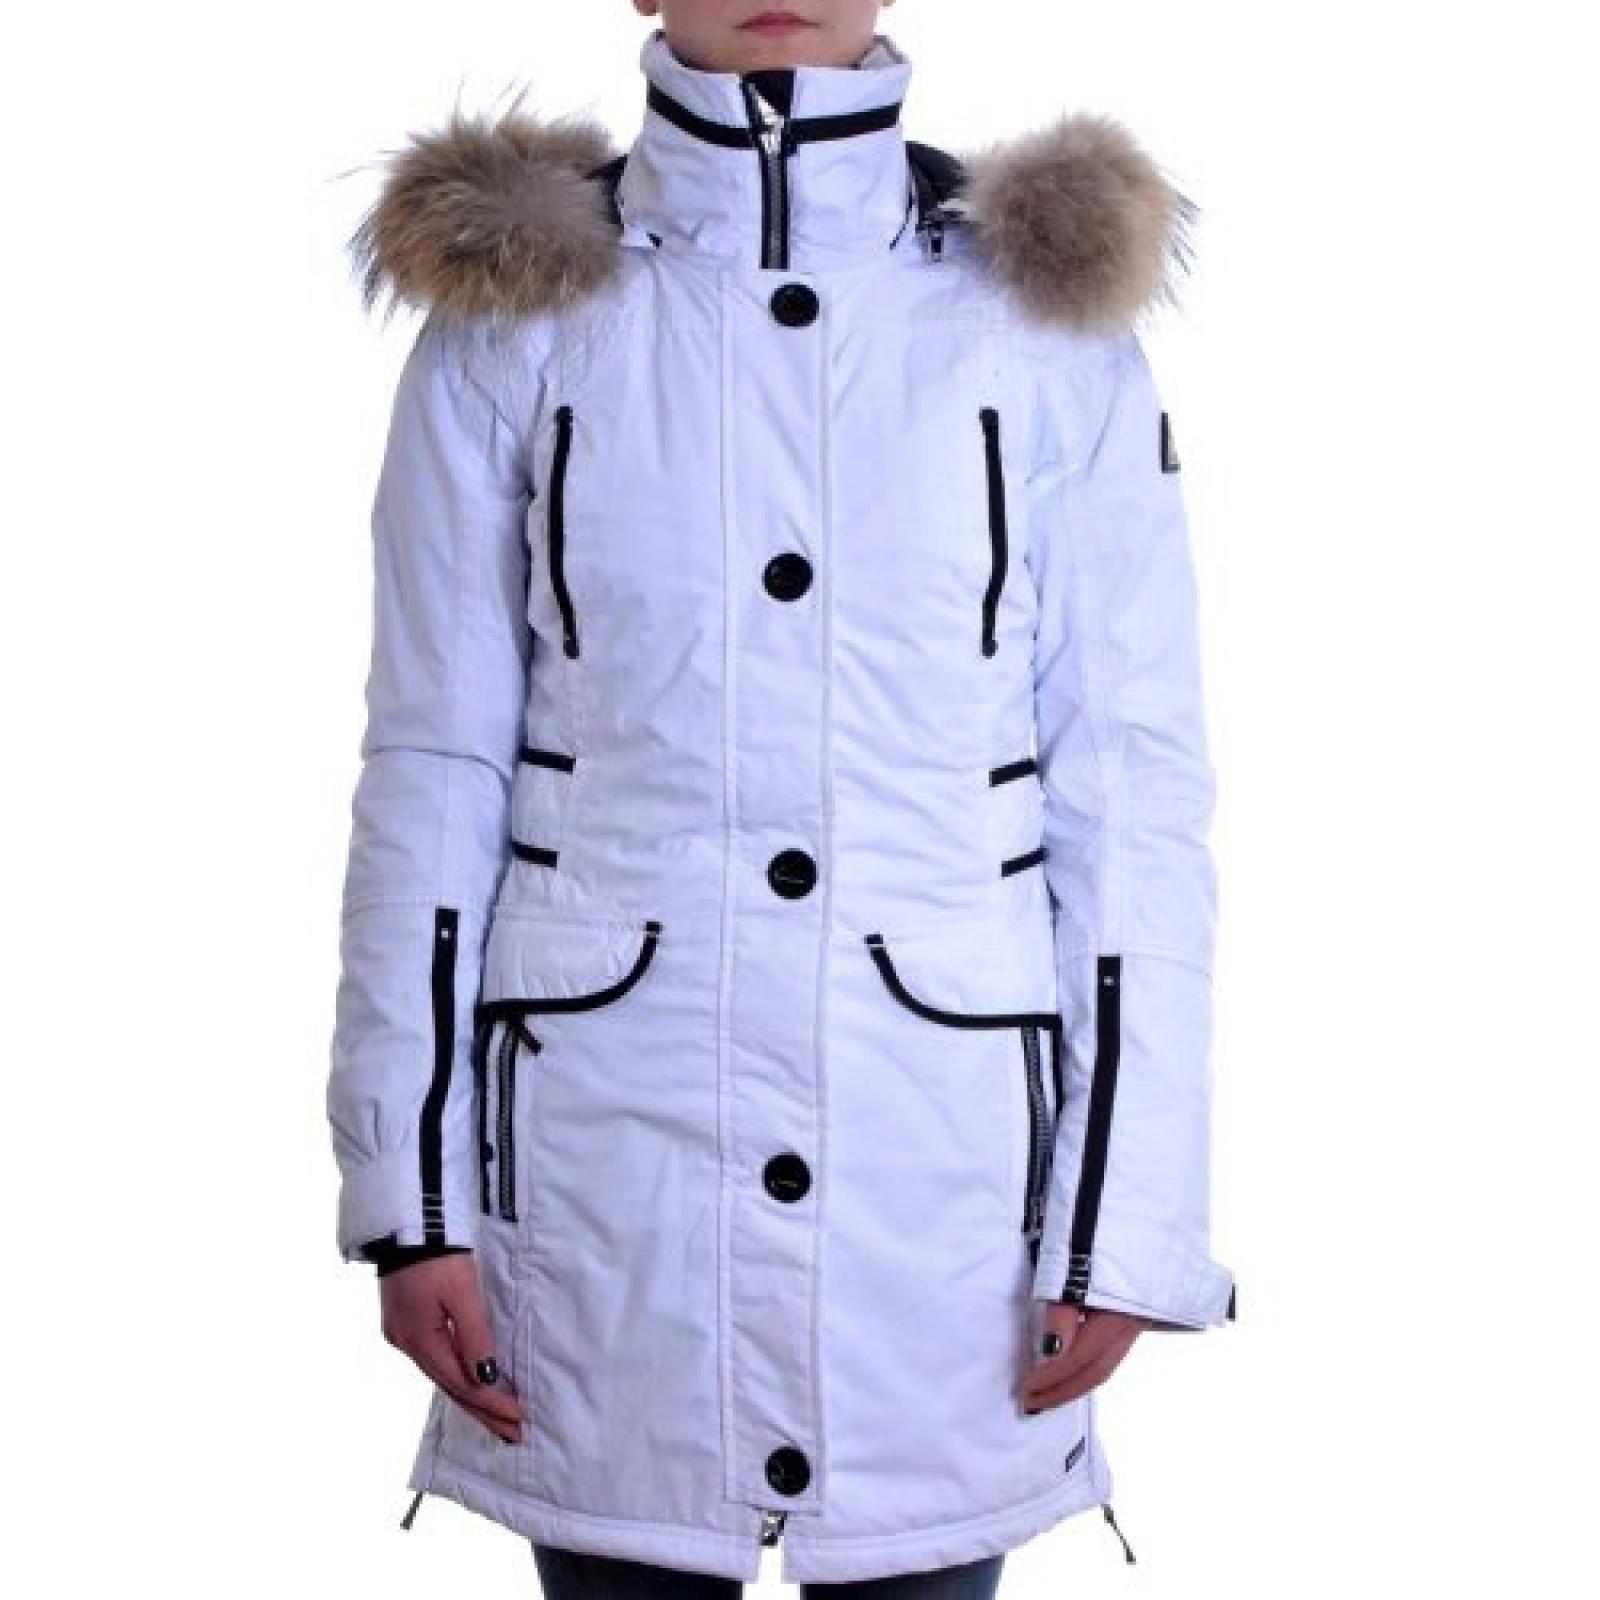 Gaastra Damenjacke Dovetail Gr. L UVP 369,95 Euro 36112522 Weiß Damen Jacke